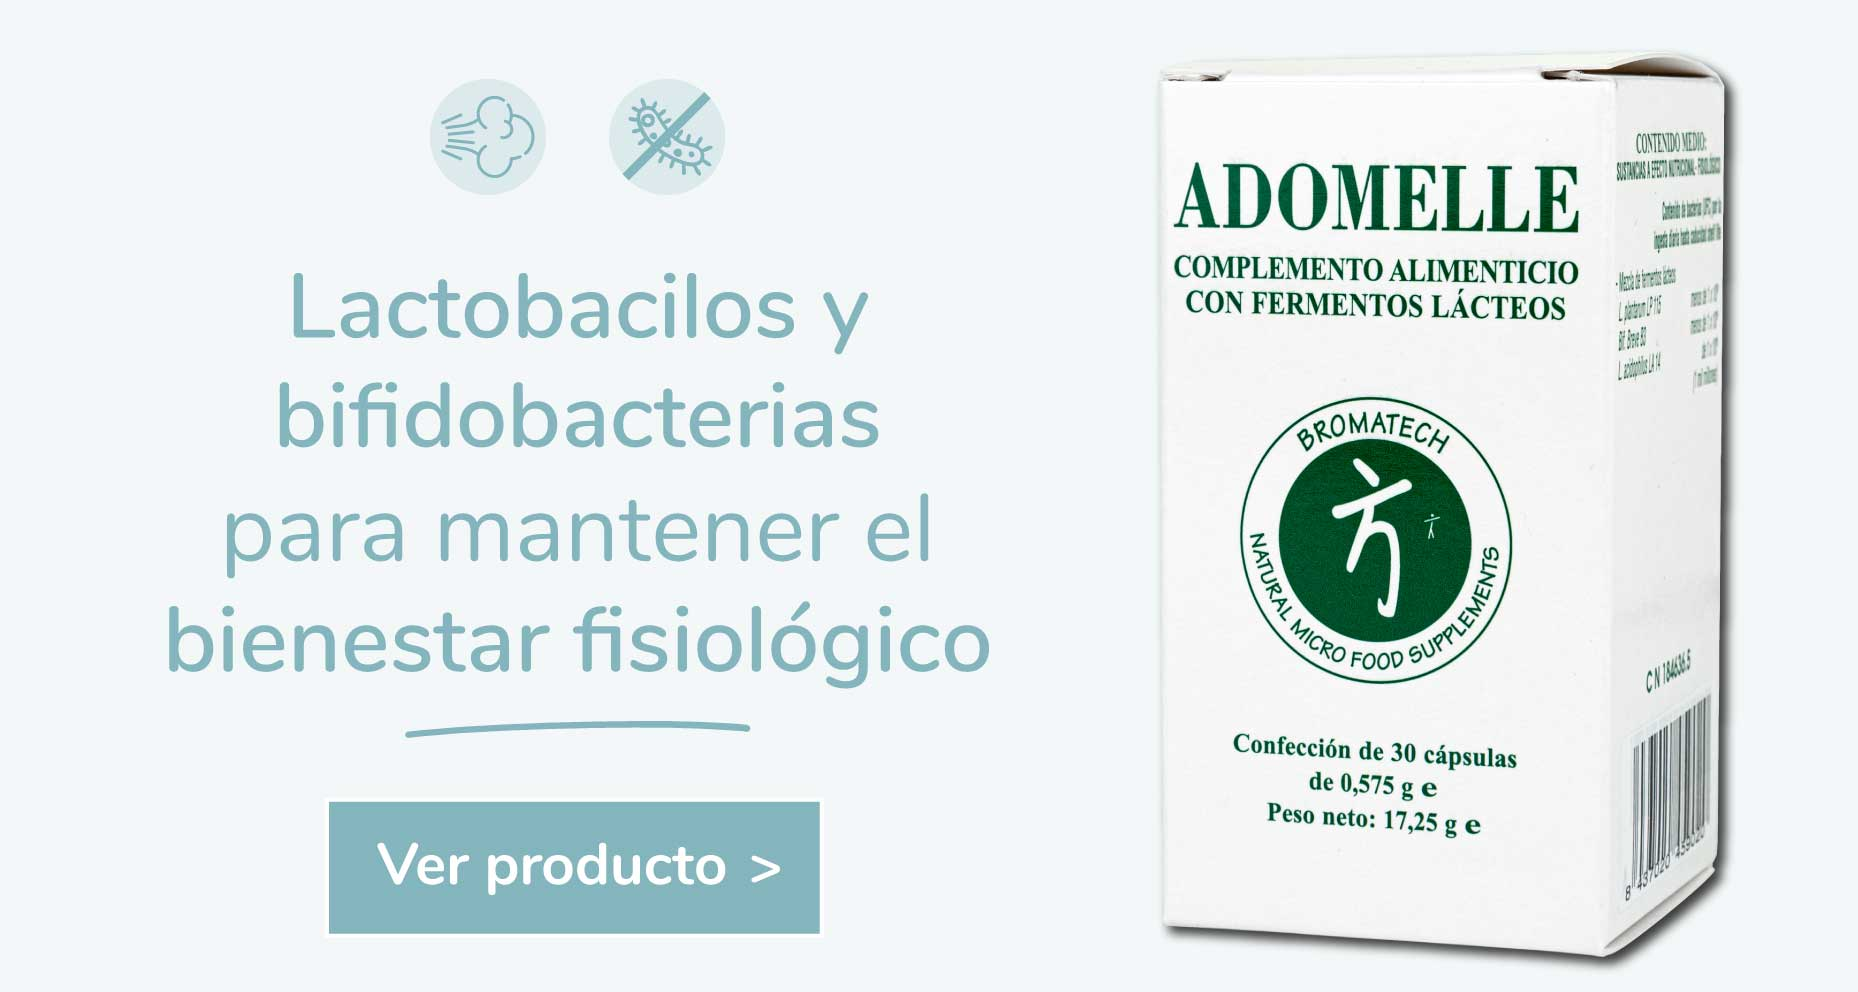 Probióticos adomelle obesidad microbiota sibo